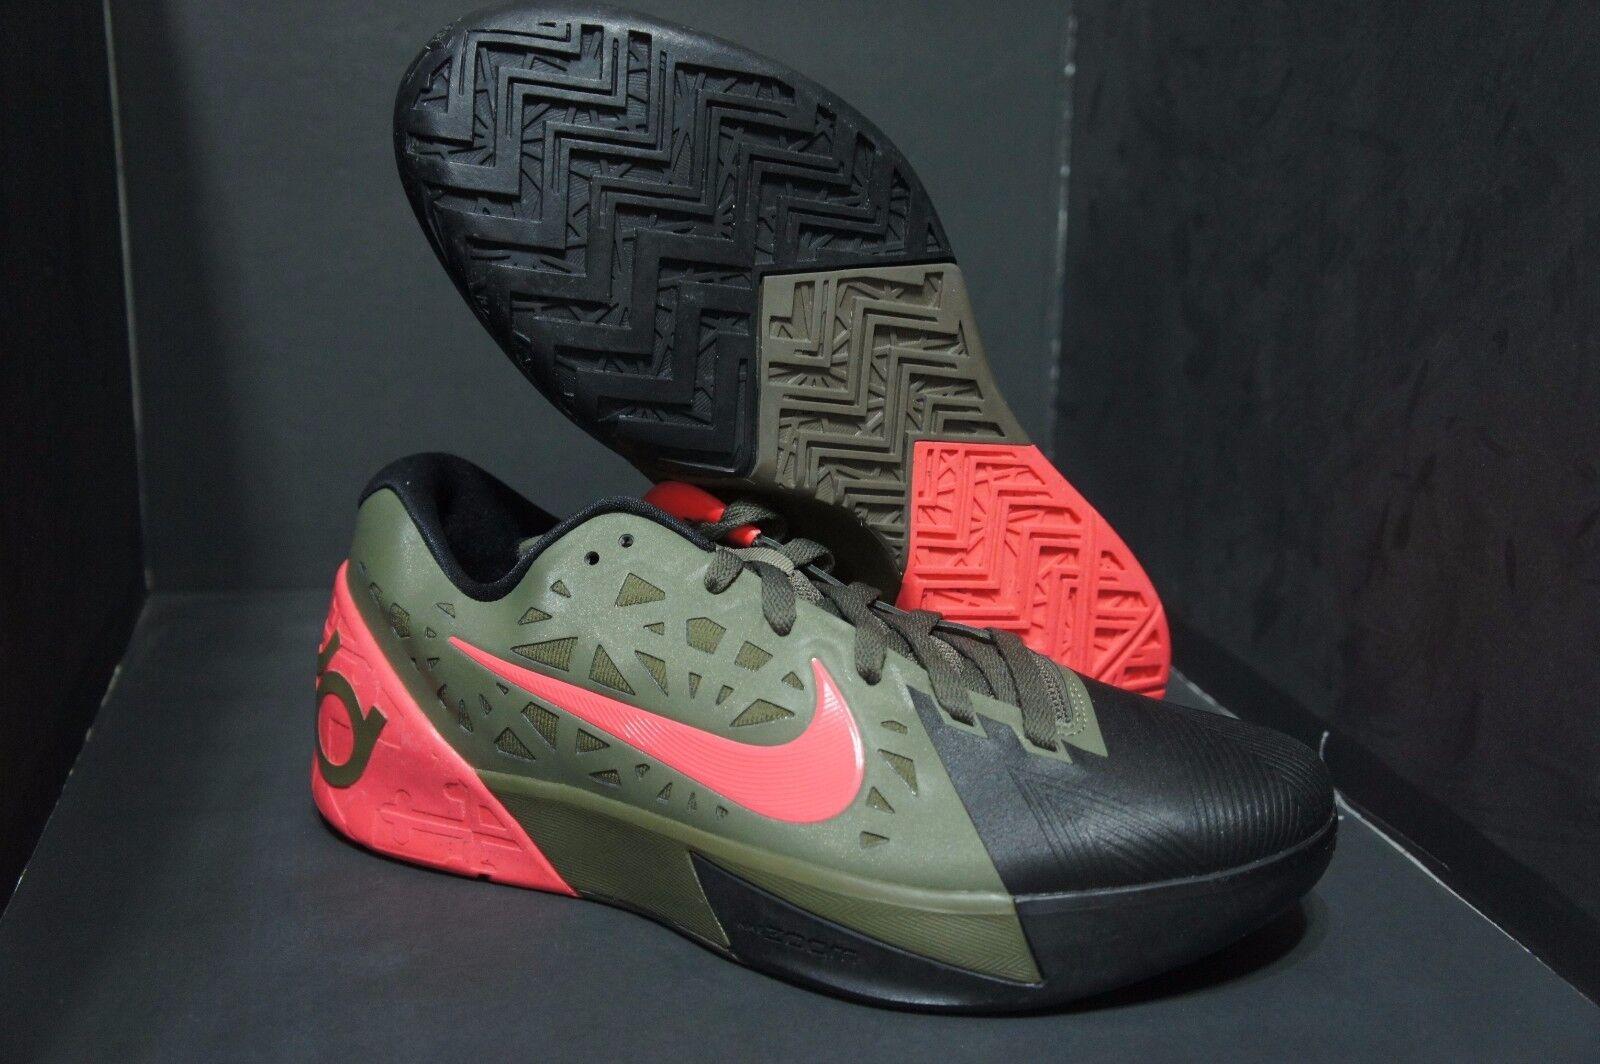 Nike KD Trey 5 II Medium Olive/Atomic Red Size 9.5 Promo Sample